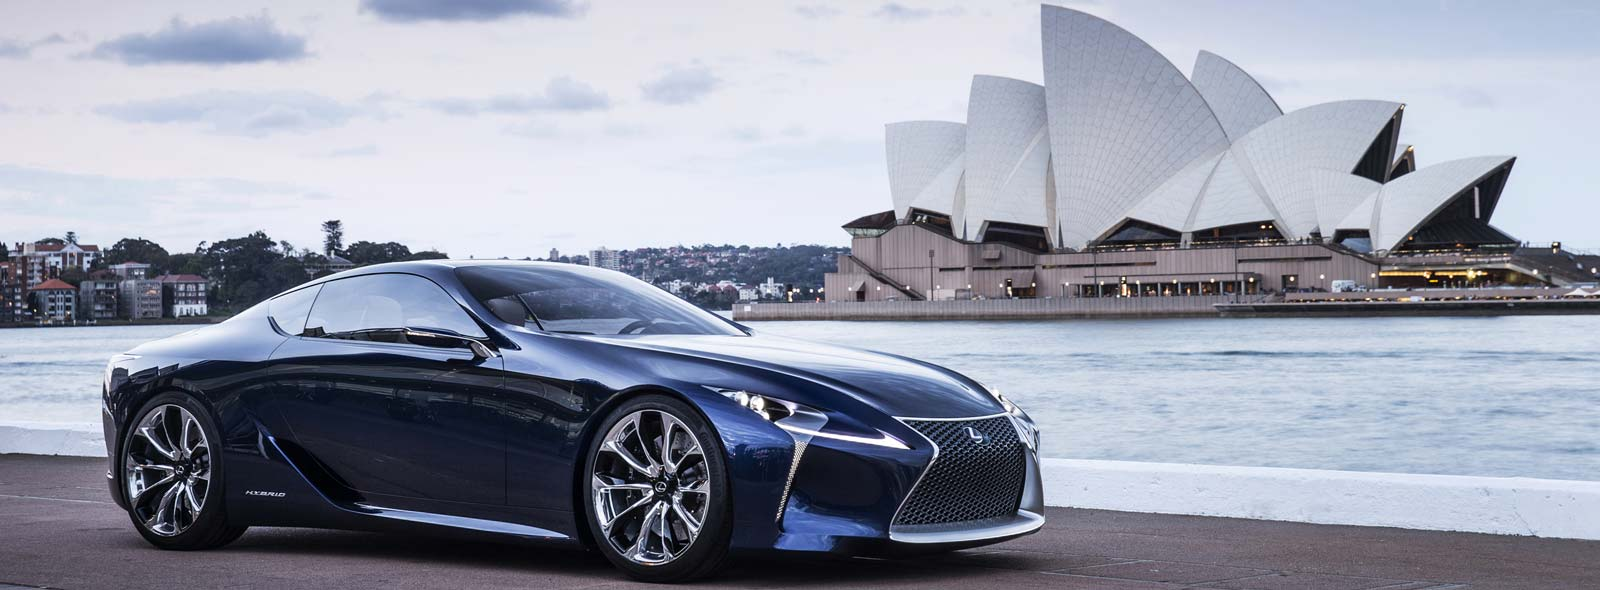 Aerodinamik Lexus LF LC Concept avtomobili